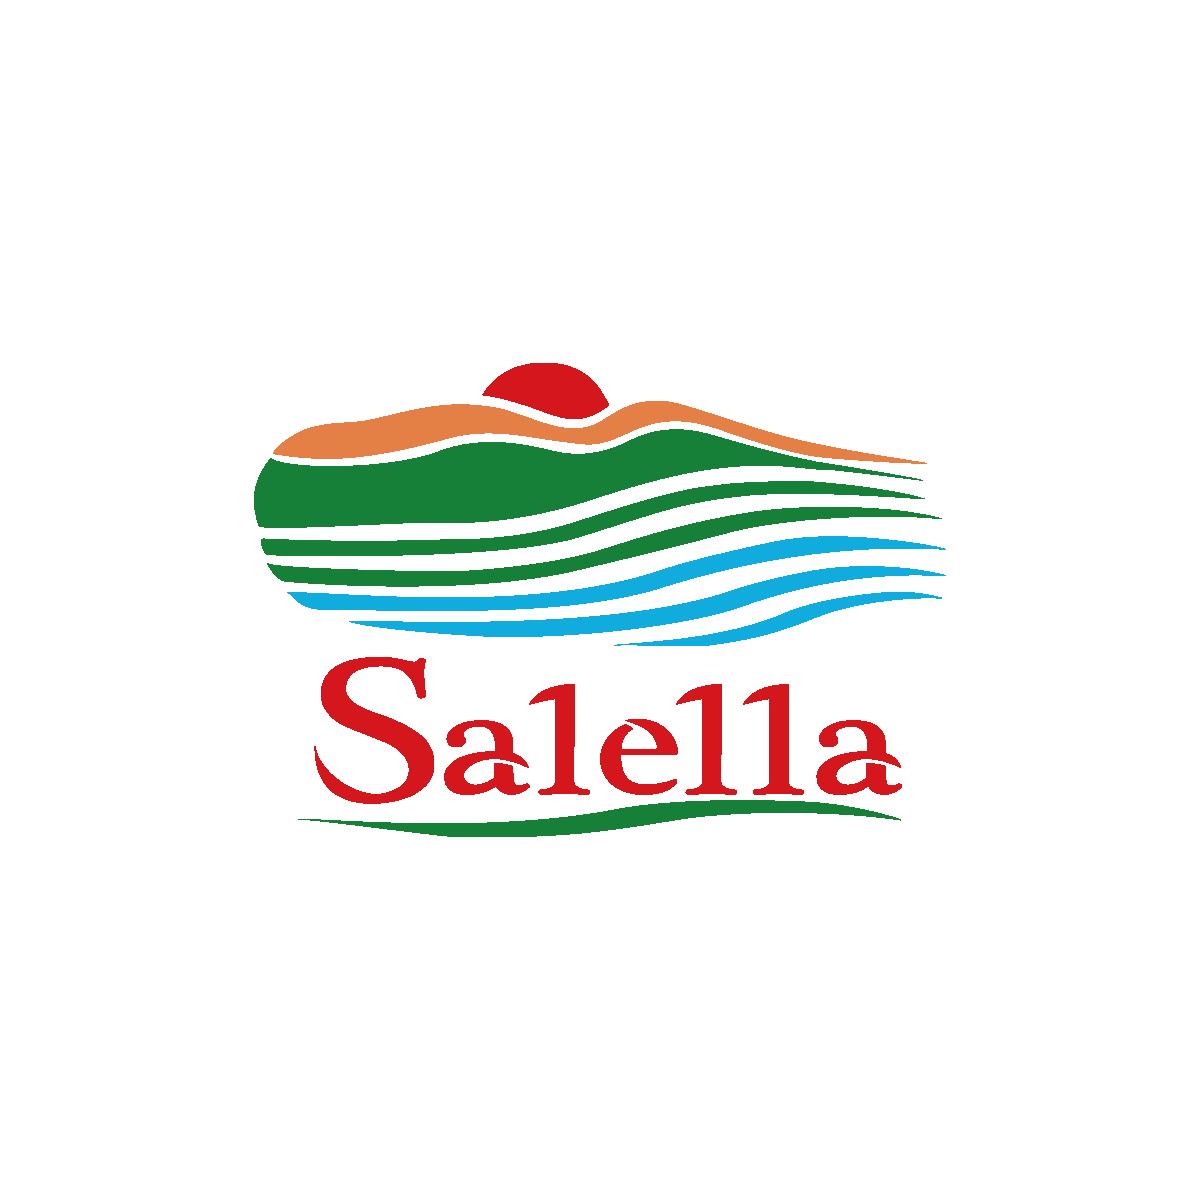 Salella